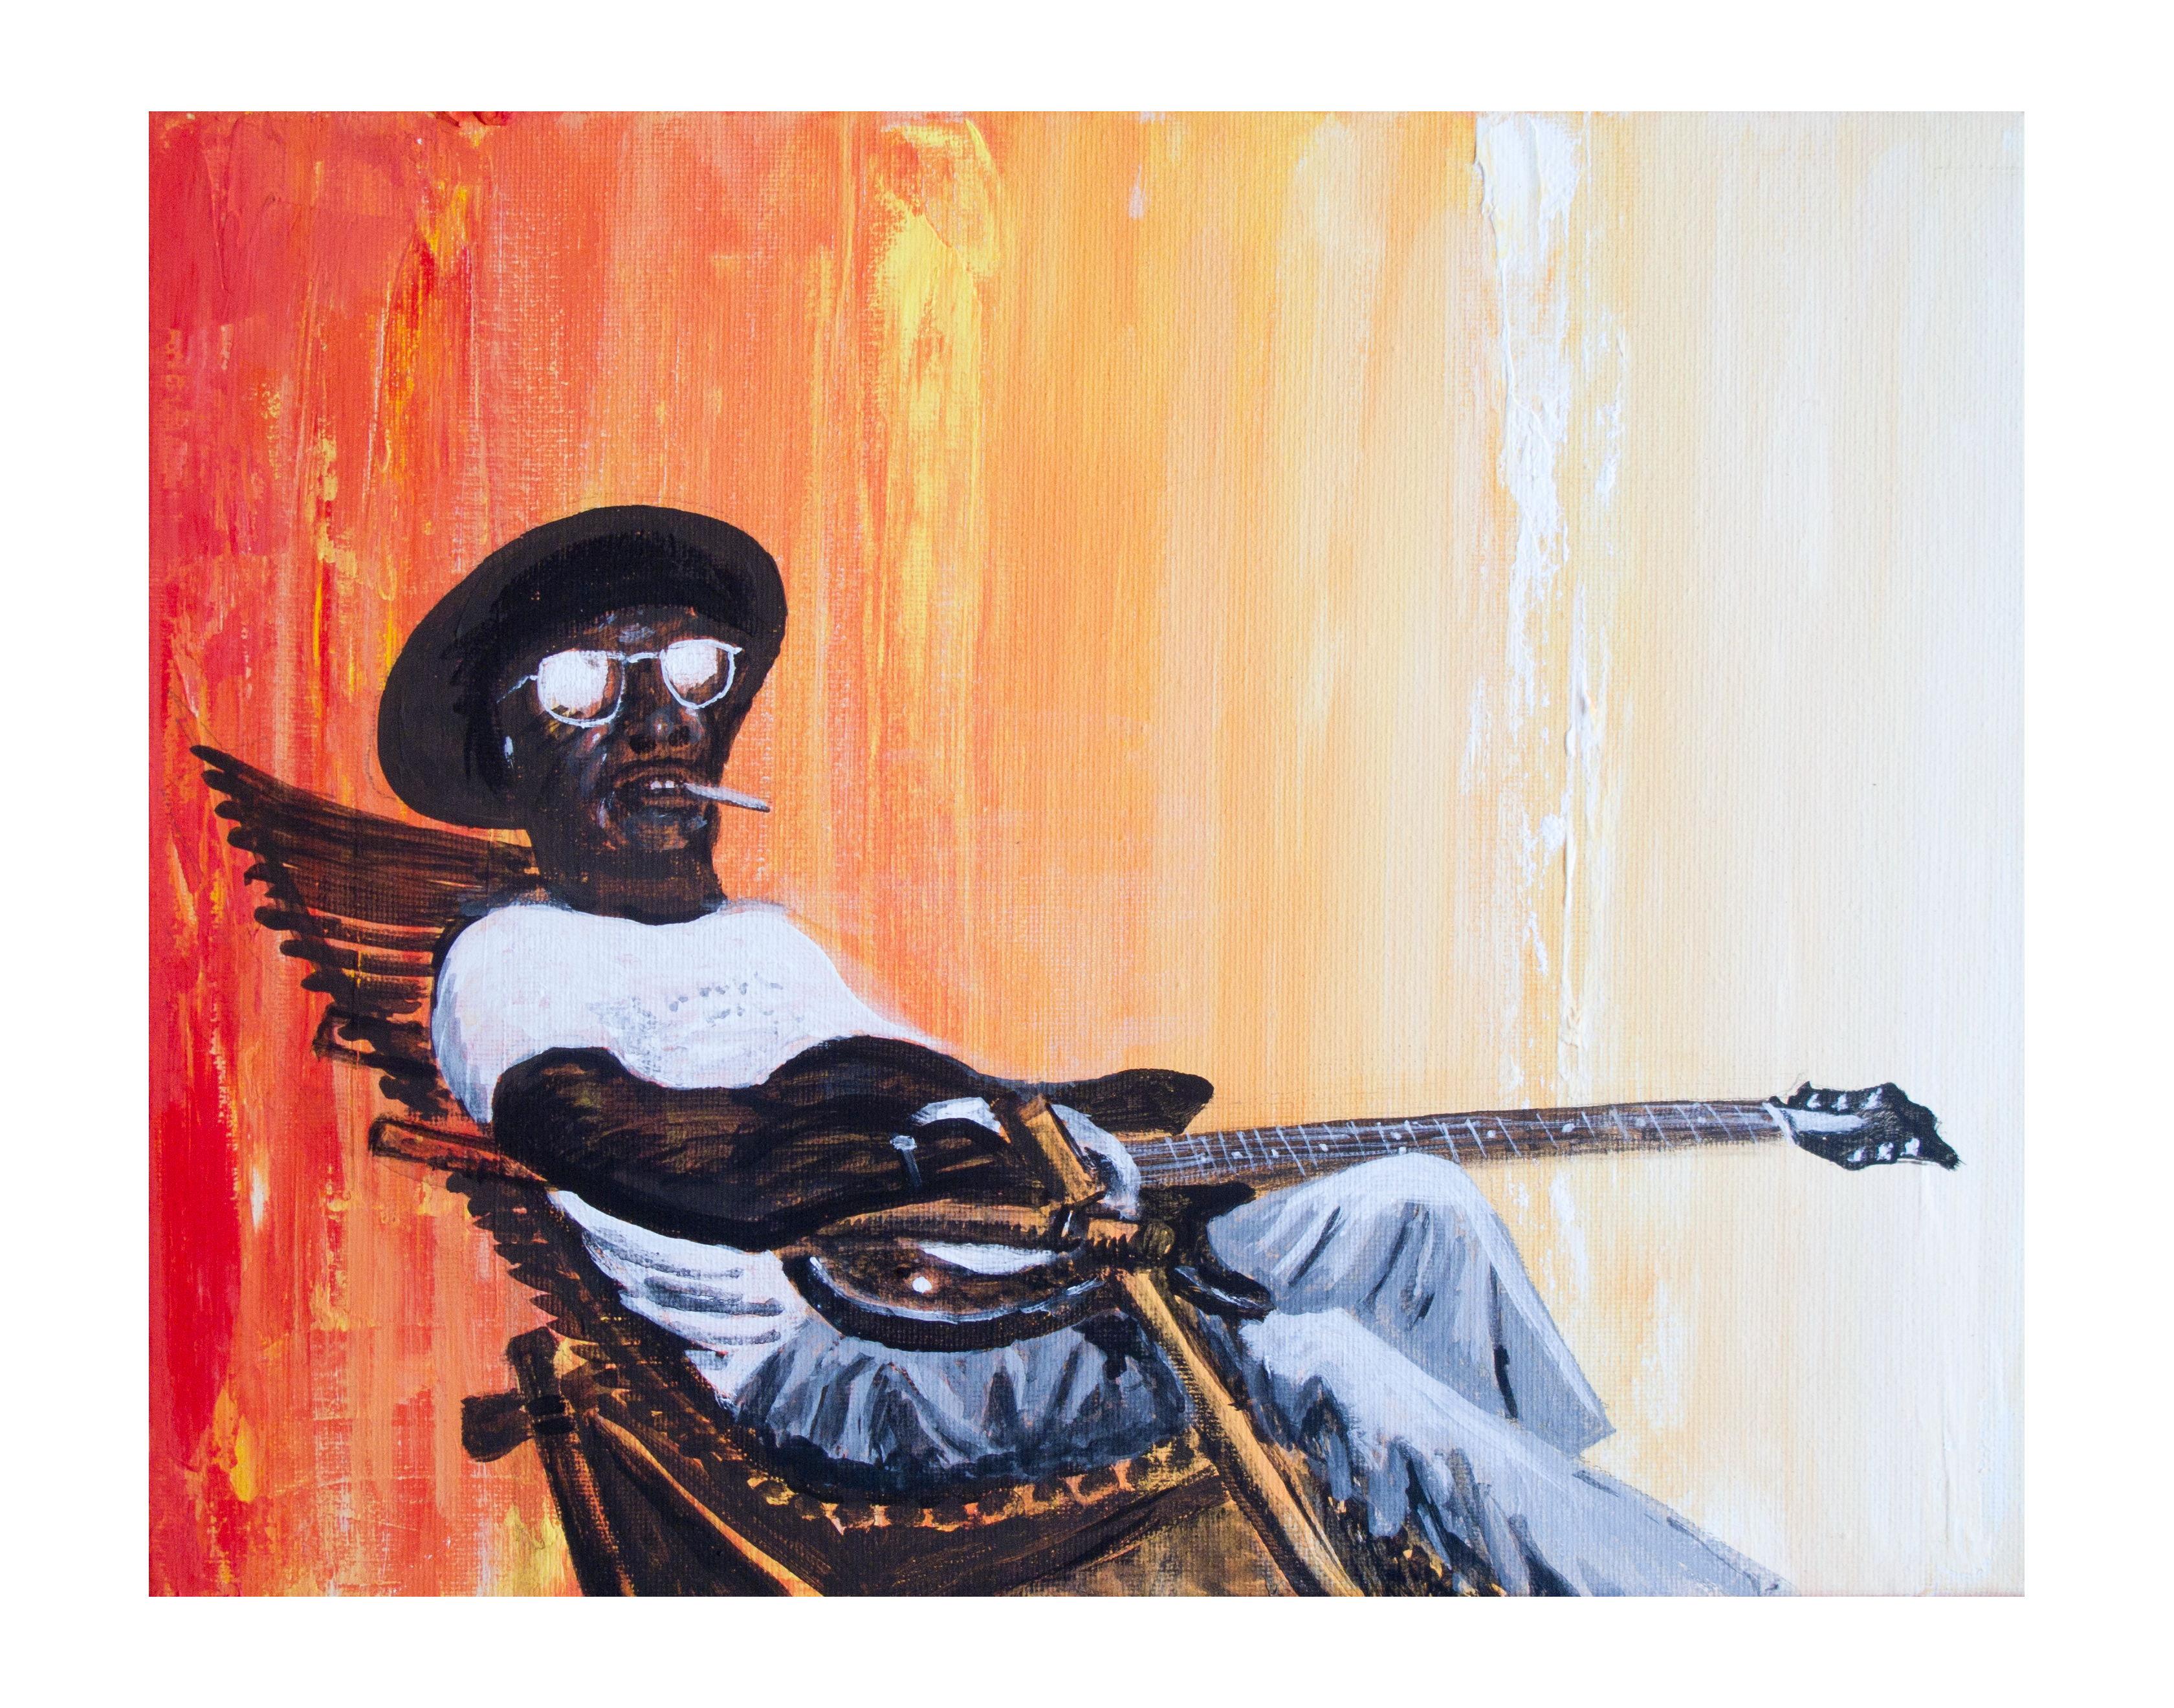 DT painting-Ali Farka Toure-11x14